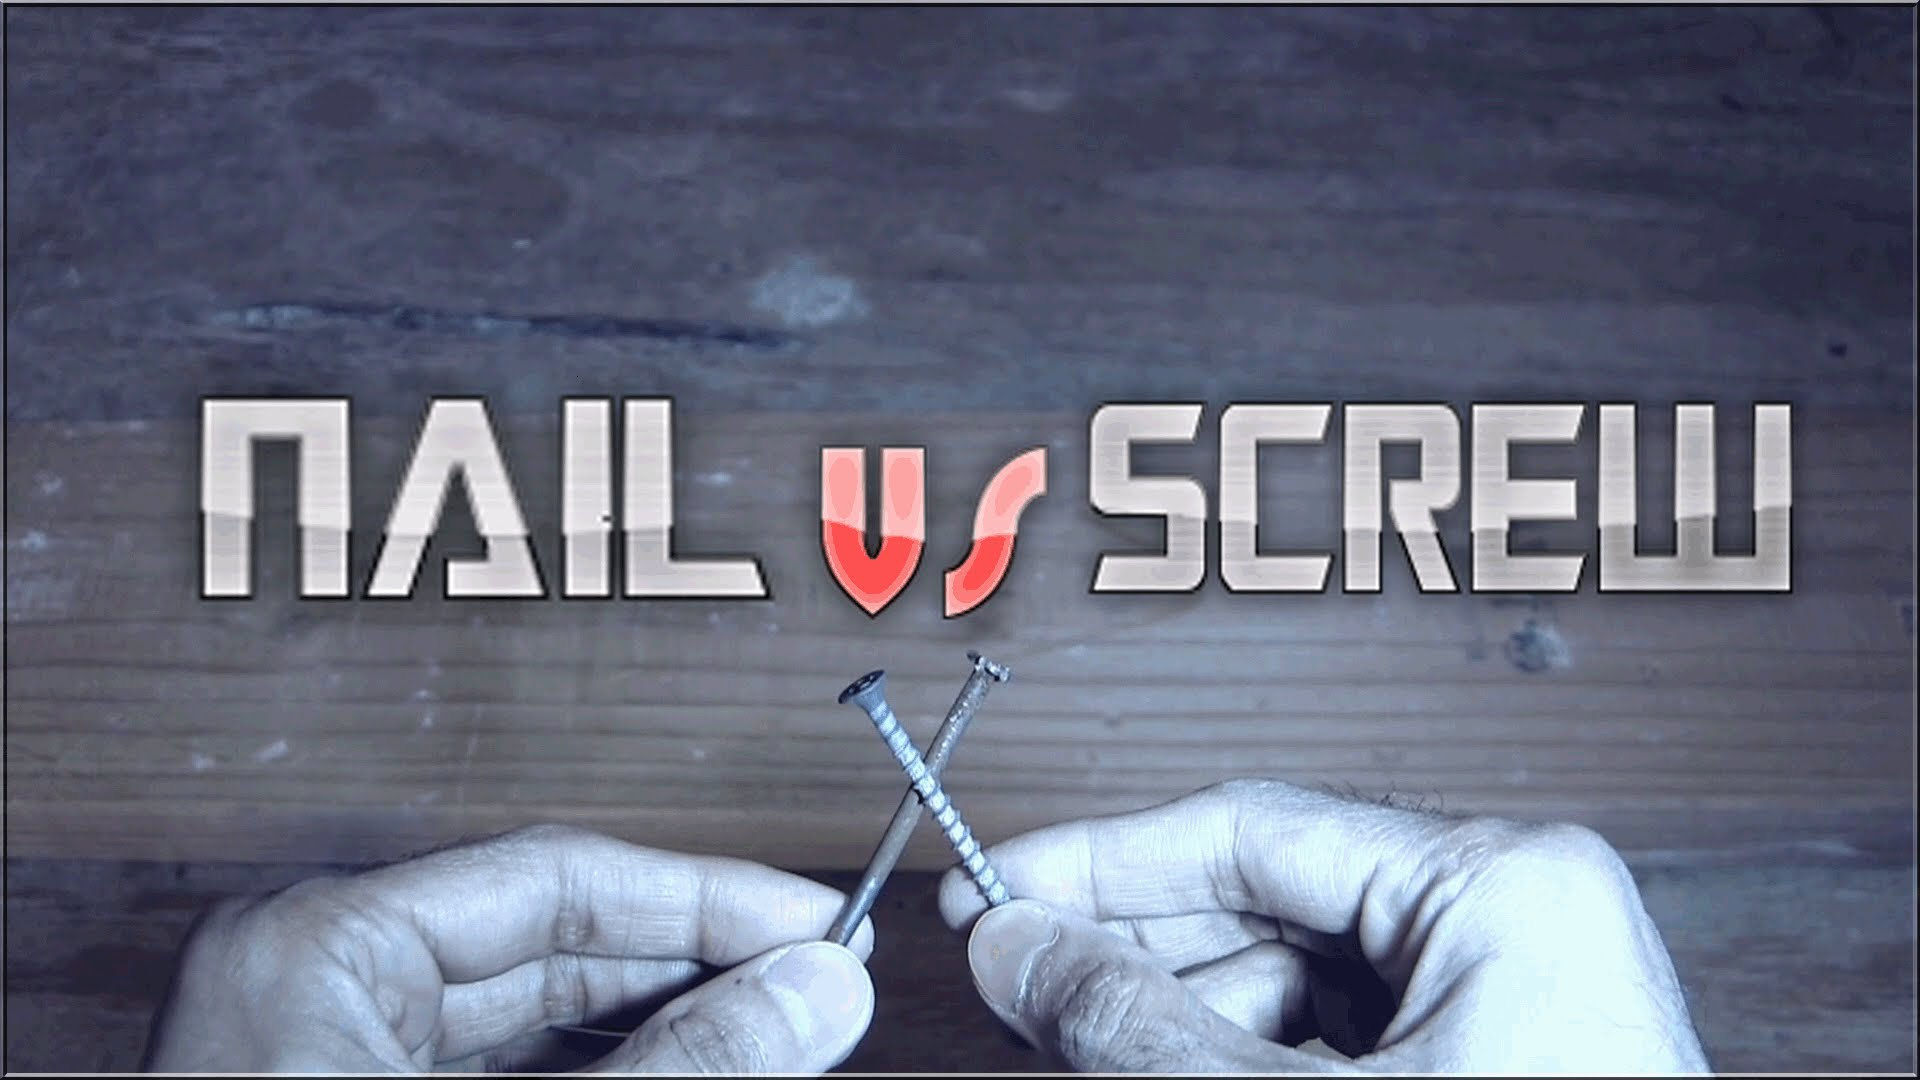 Nails or Screws